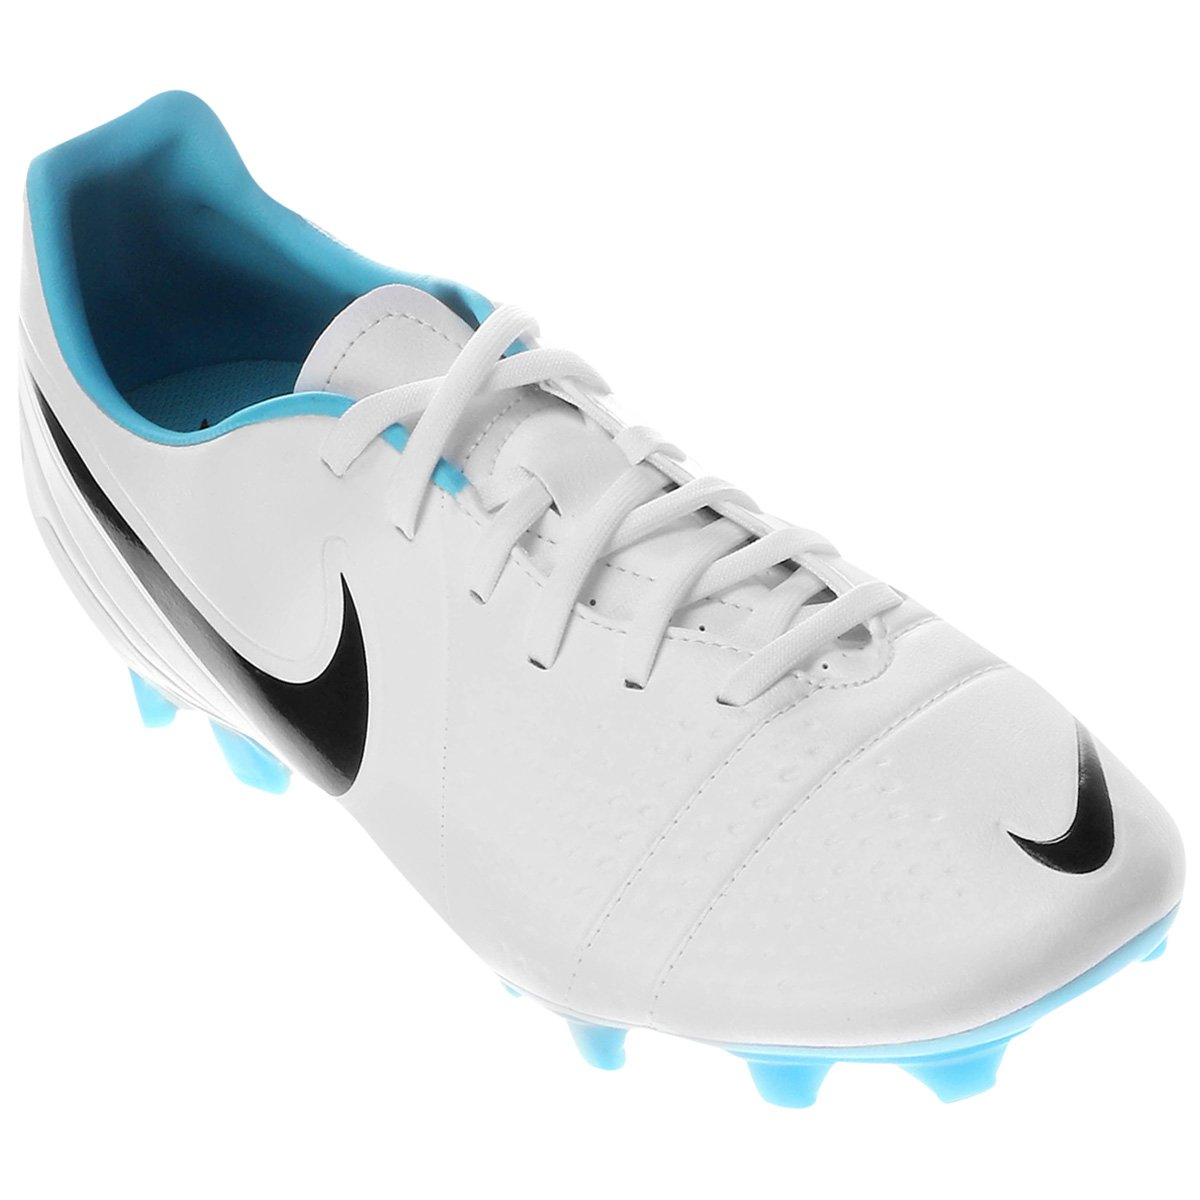 93aae020a3 Chuteira Nike CTR360 Trequartista 3 FG